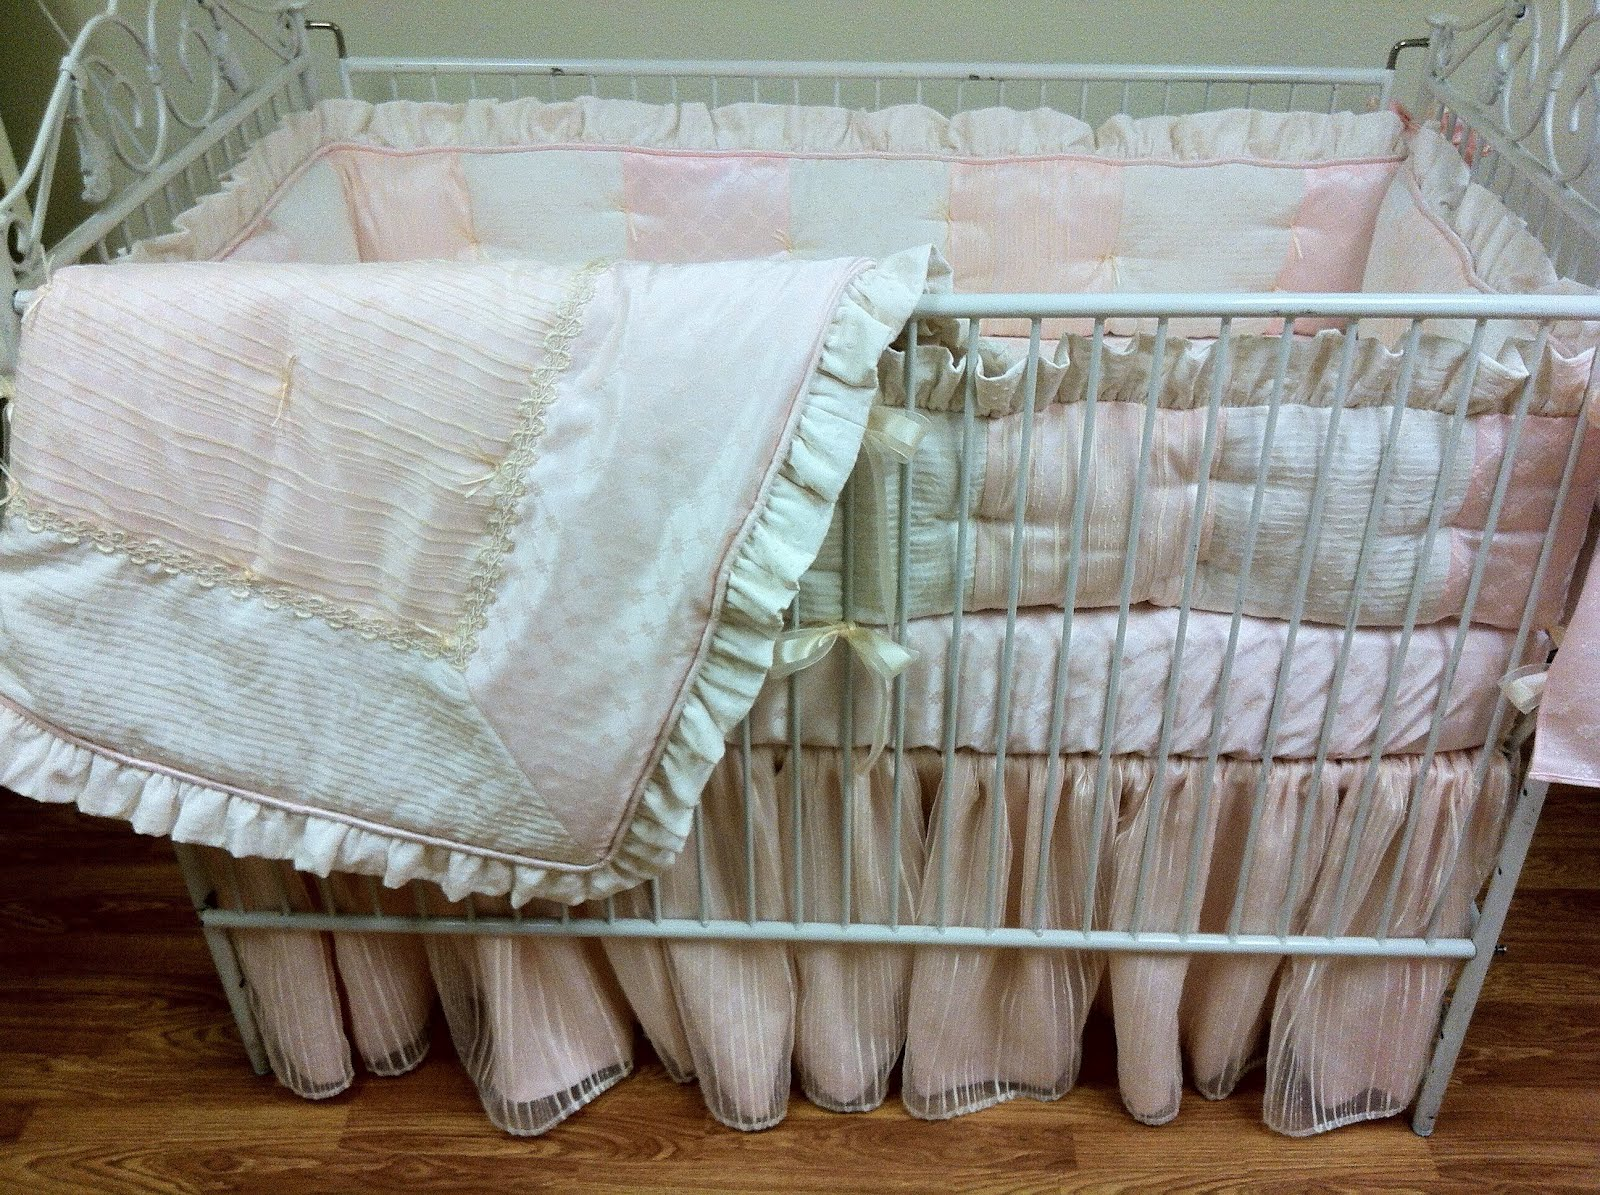 Designer Baby Bedding By Nava S Designs Nava S Designs Is